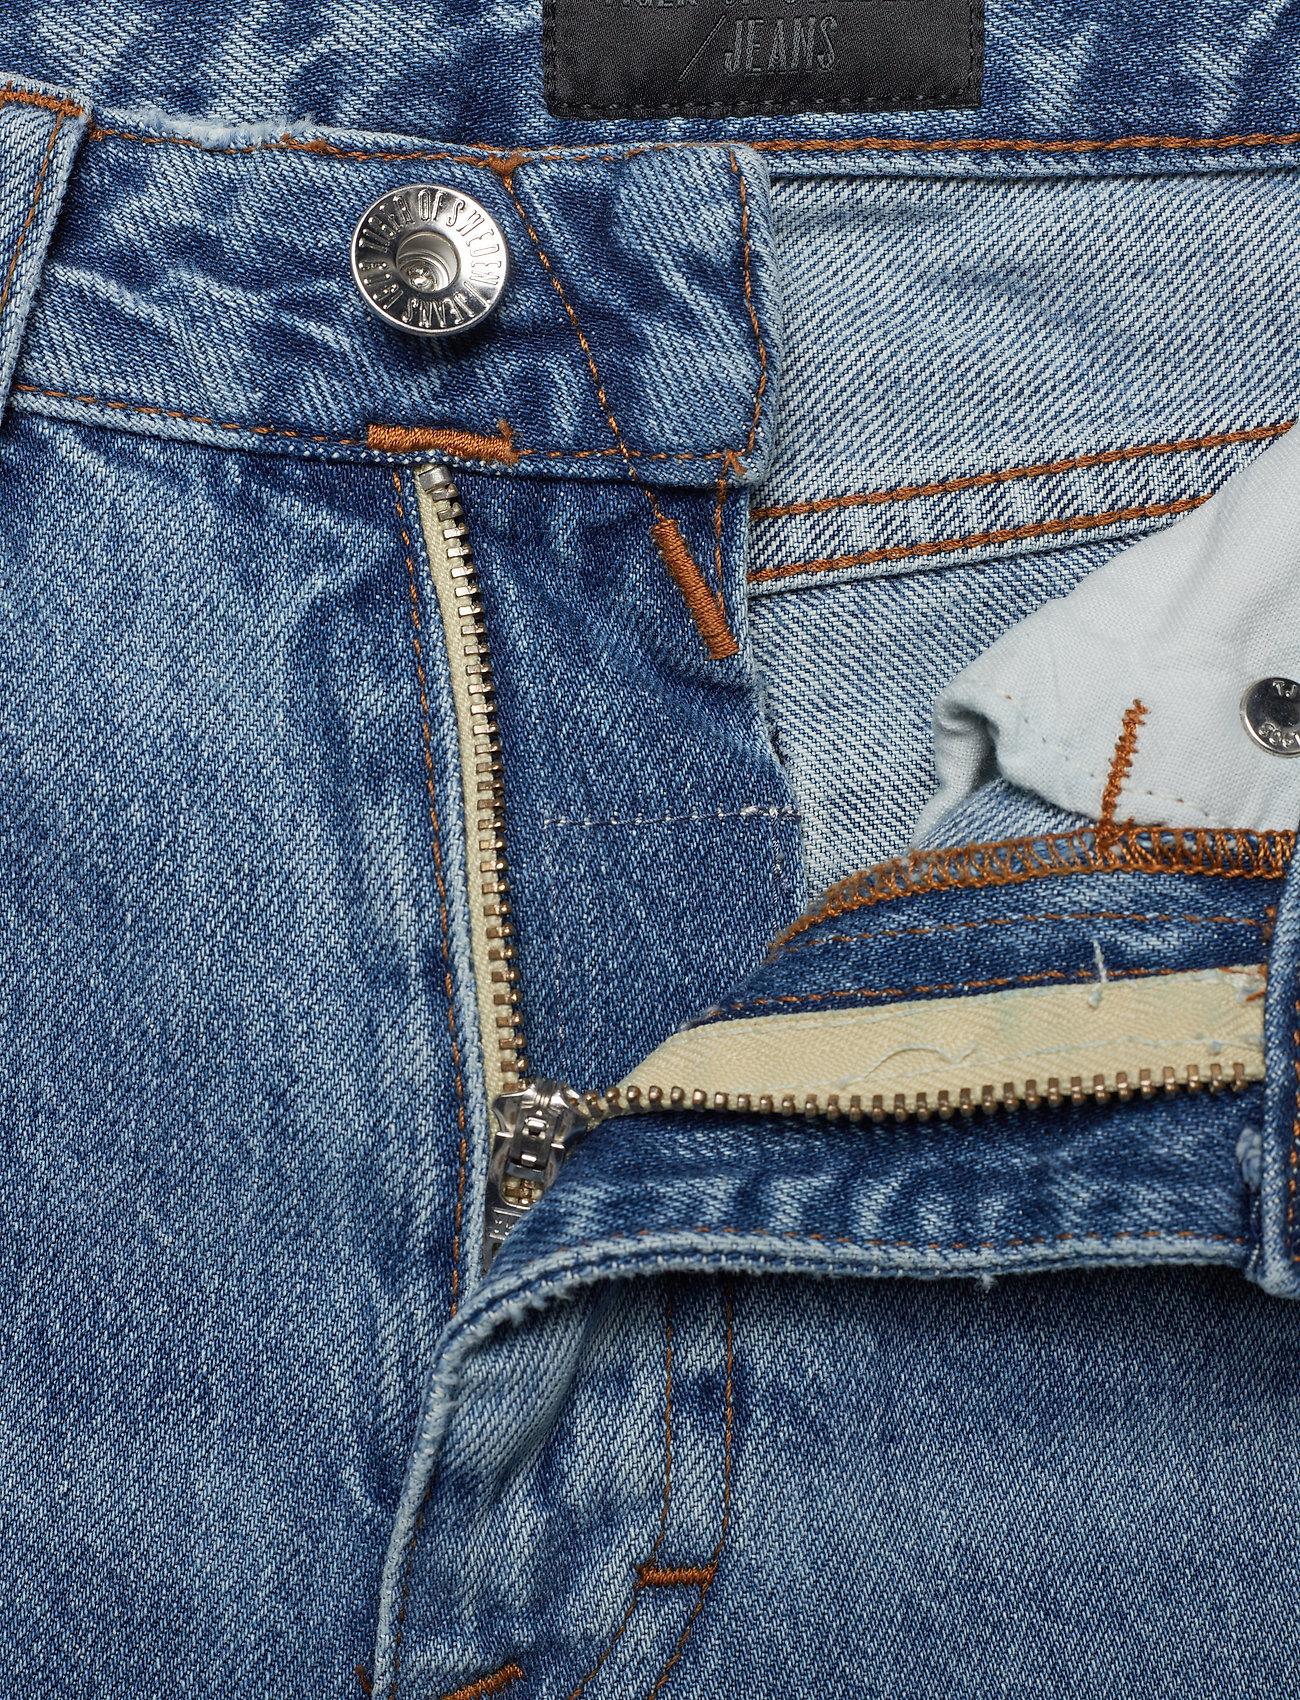 Looselight Jeans BlueTiger Of Jeans Sweden Of Sweden Looselight BlueTiger exWrBdCo